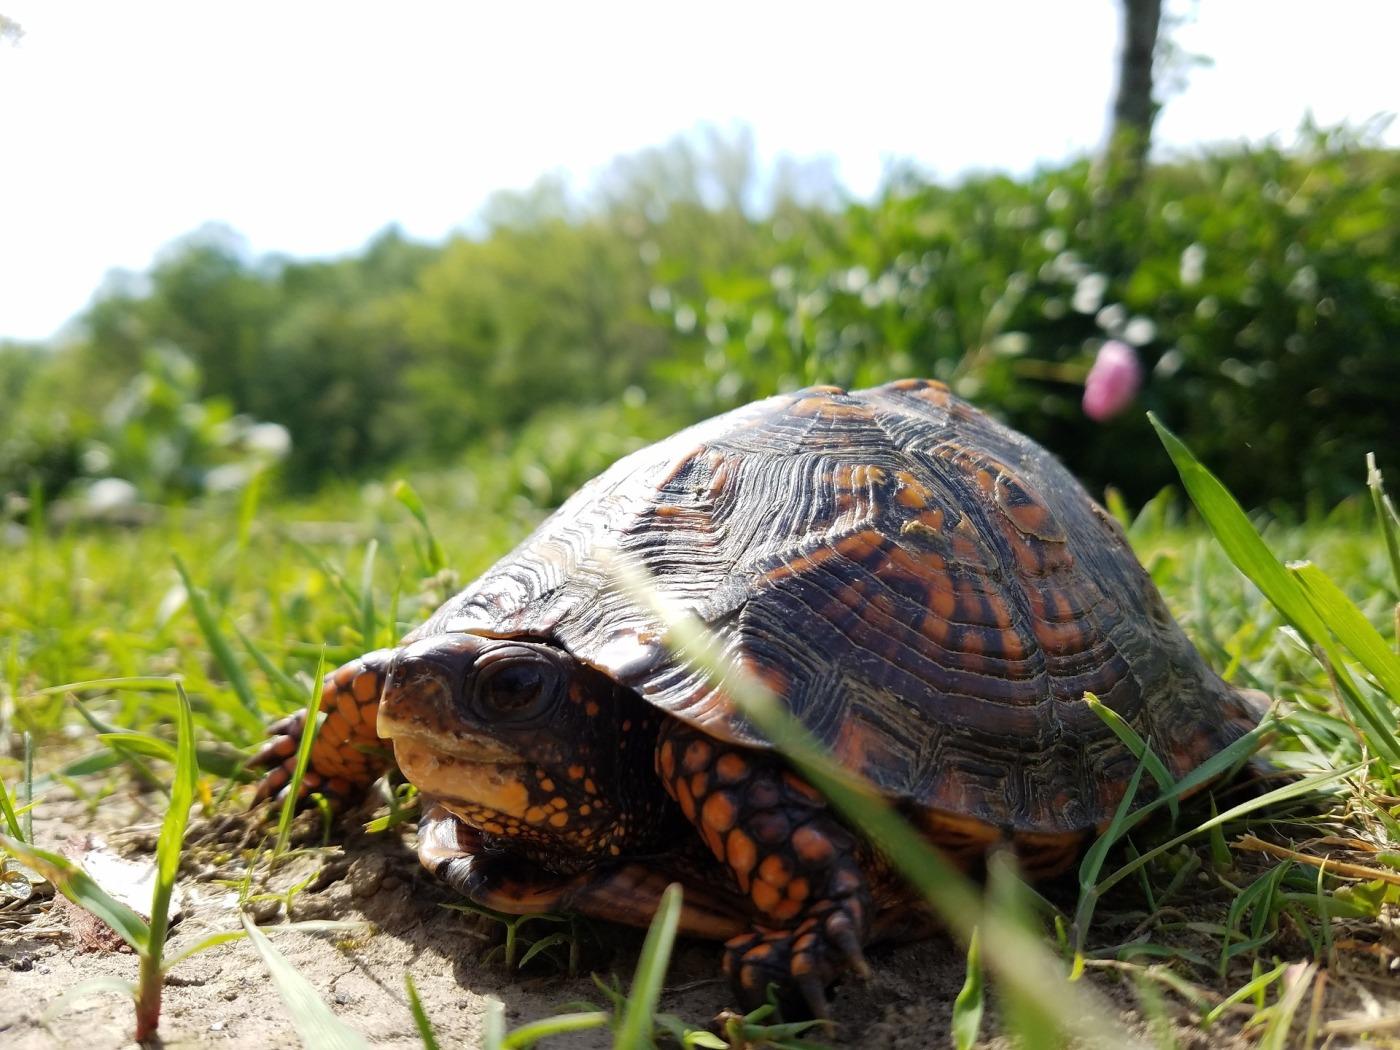 Turtle near road, crossing, grass, nature, reptile, tortoise